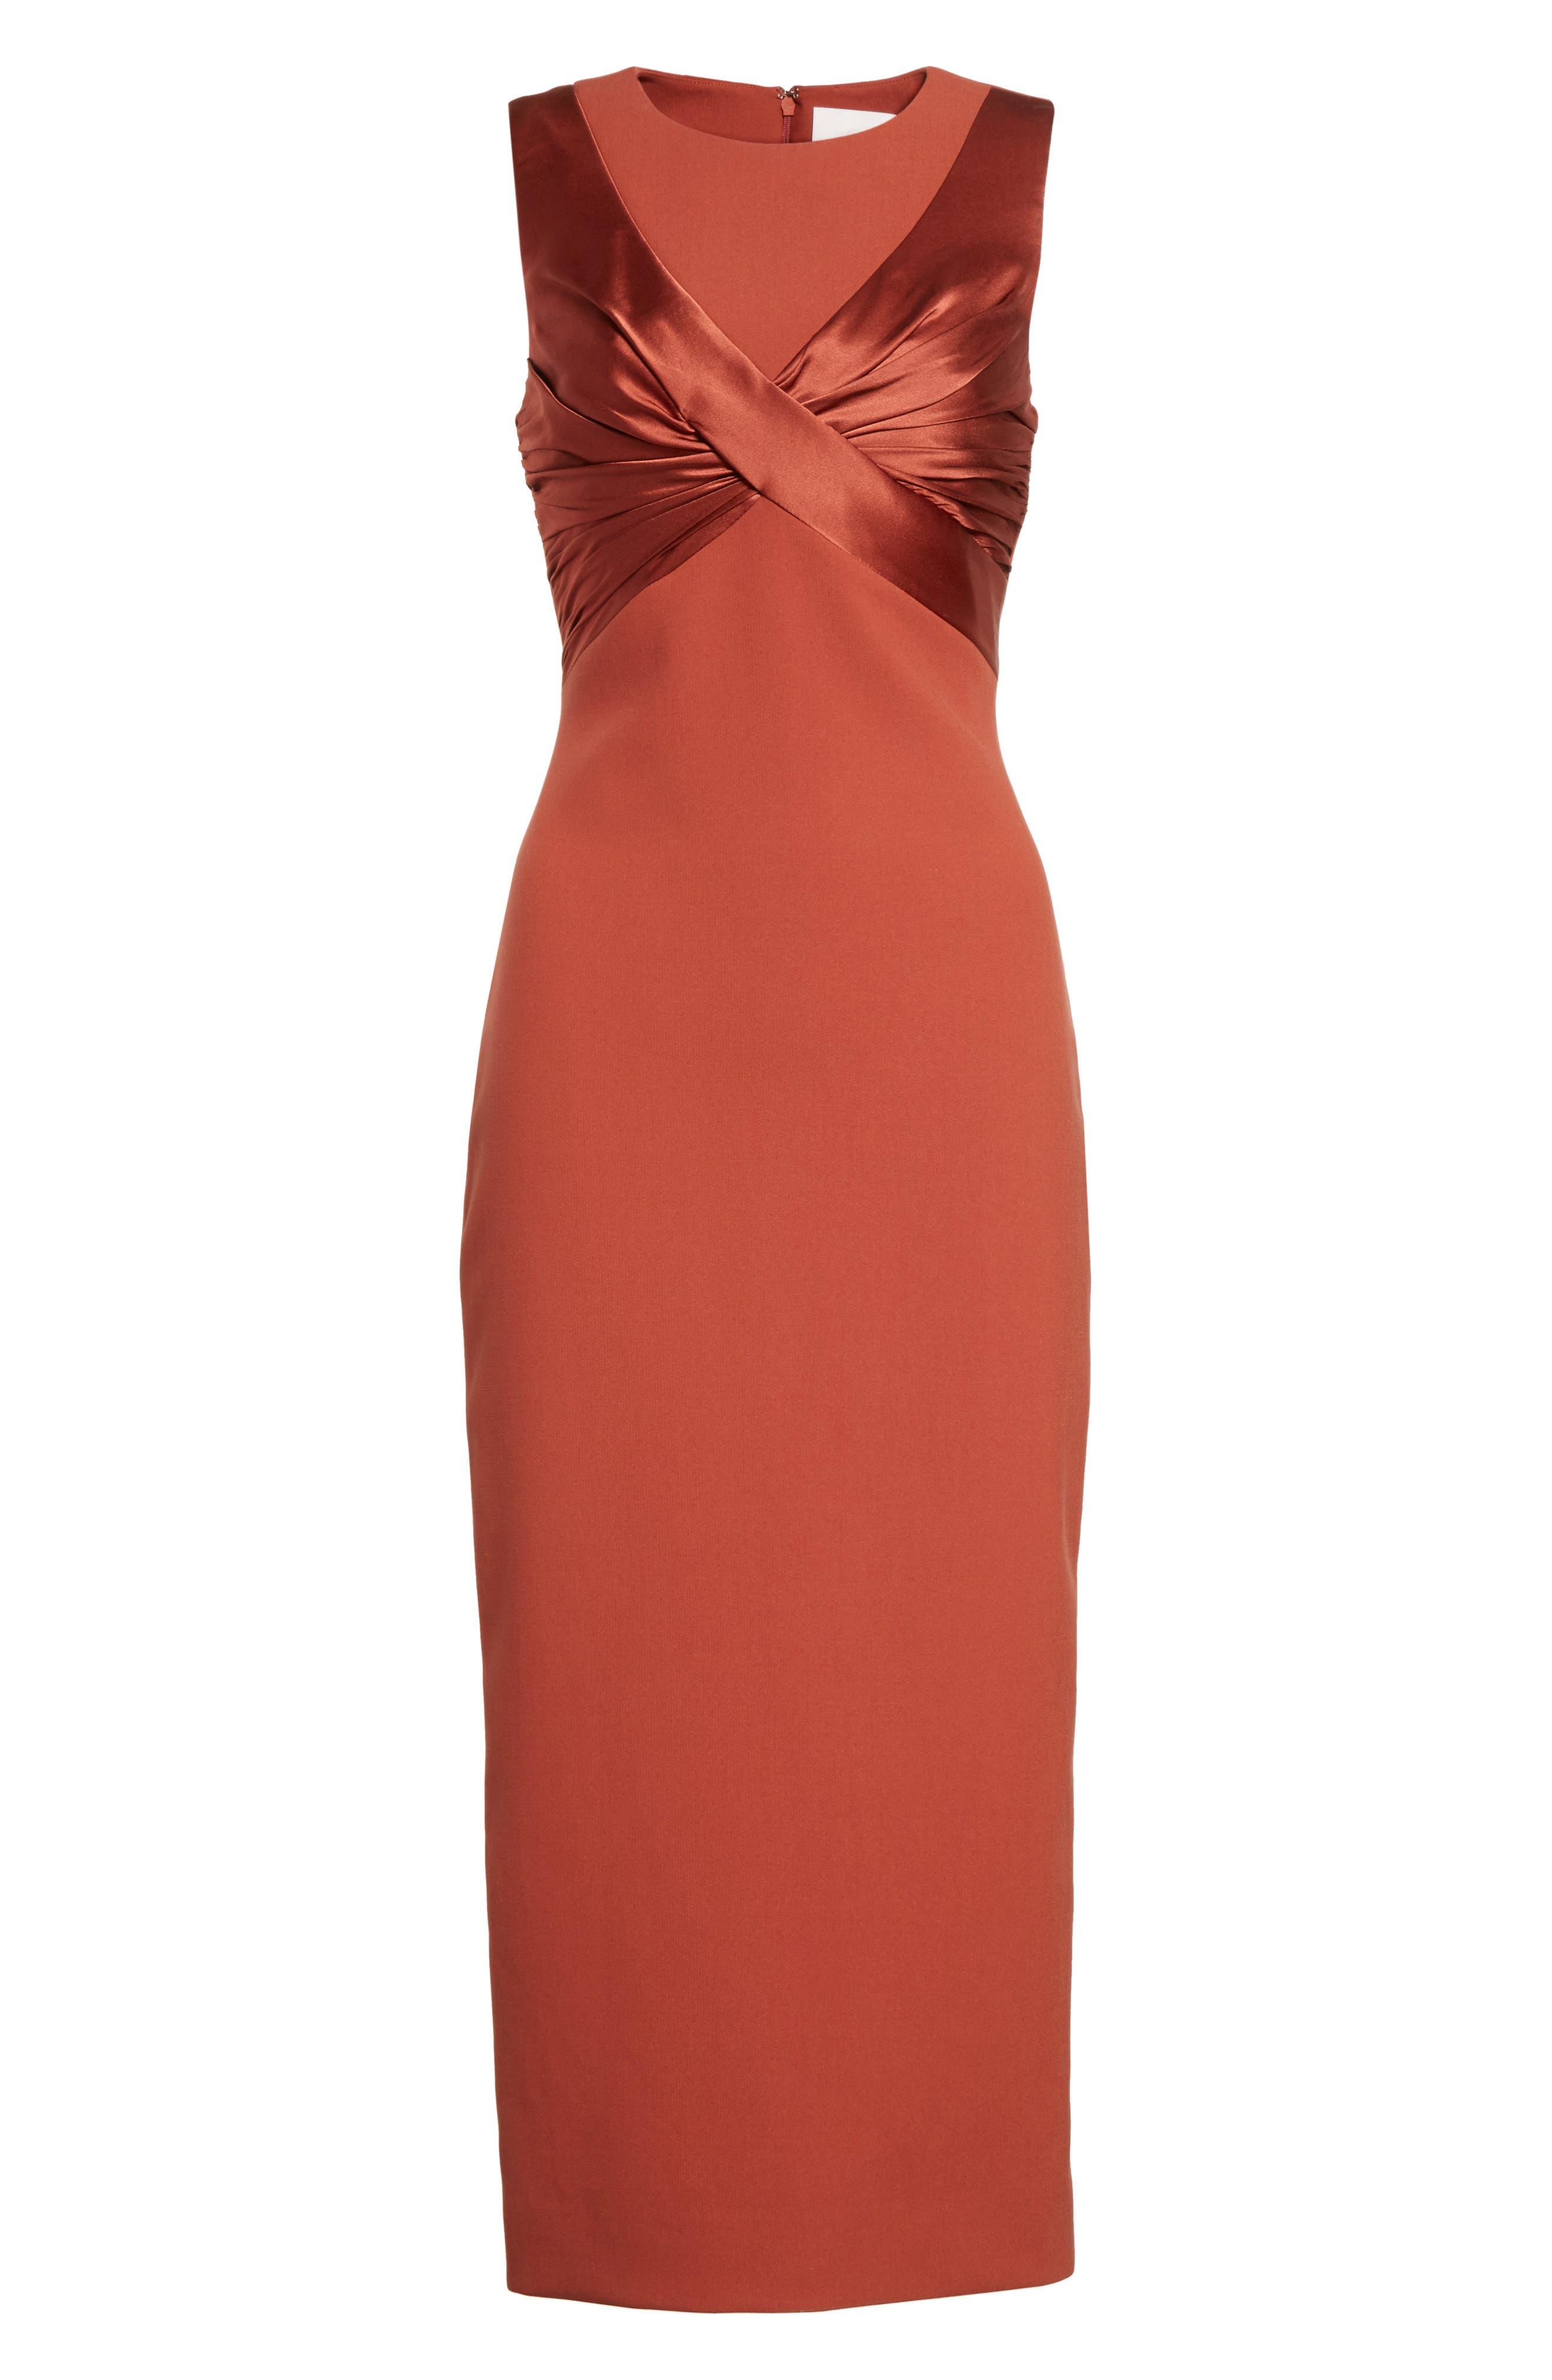 Adelise Crossover Sleeveless Sheath Dress,                             Alternate thumbnail 6, color,                             Tobacco